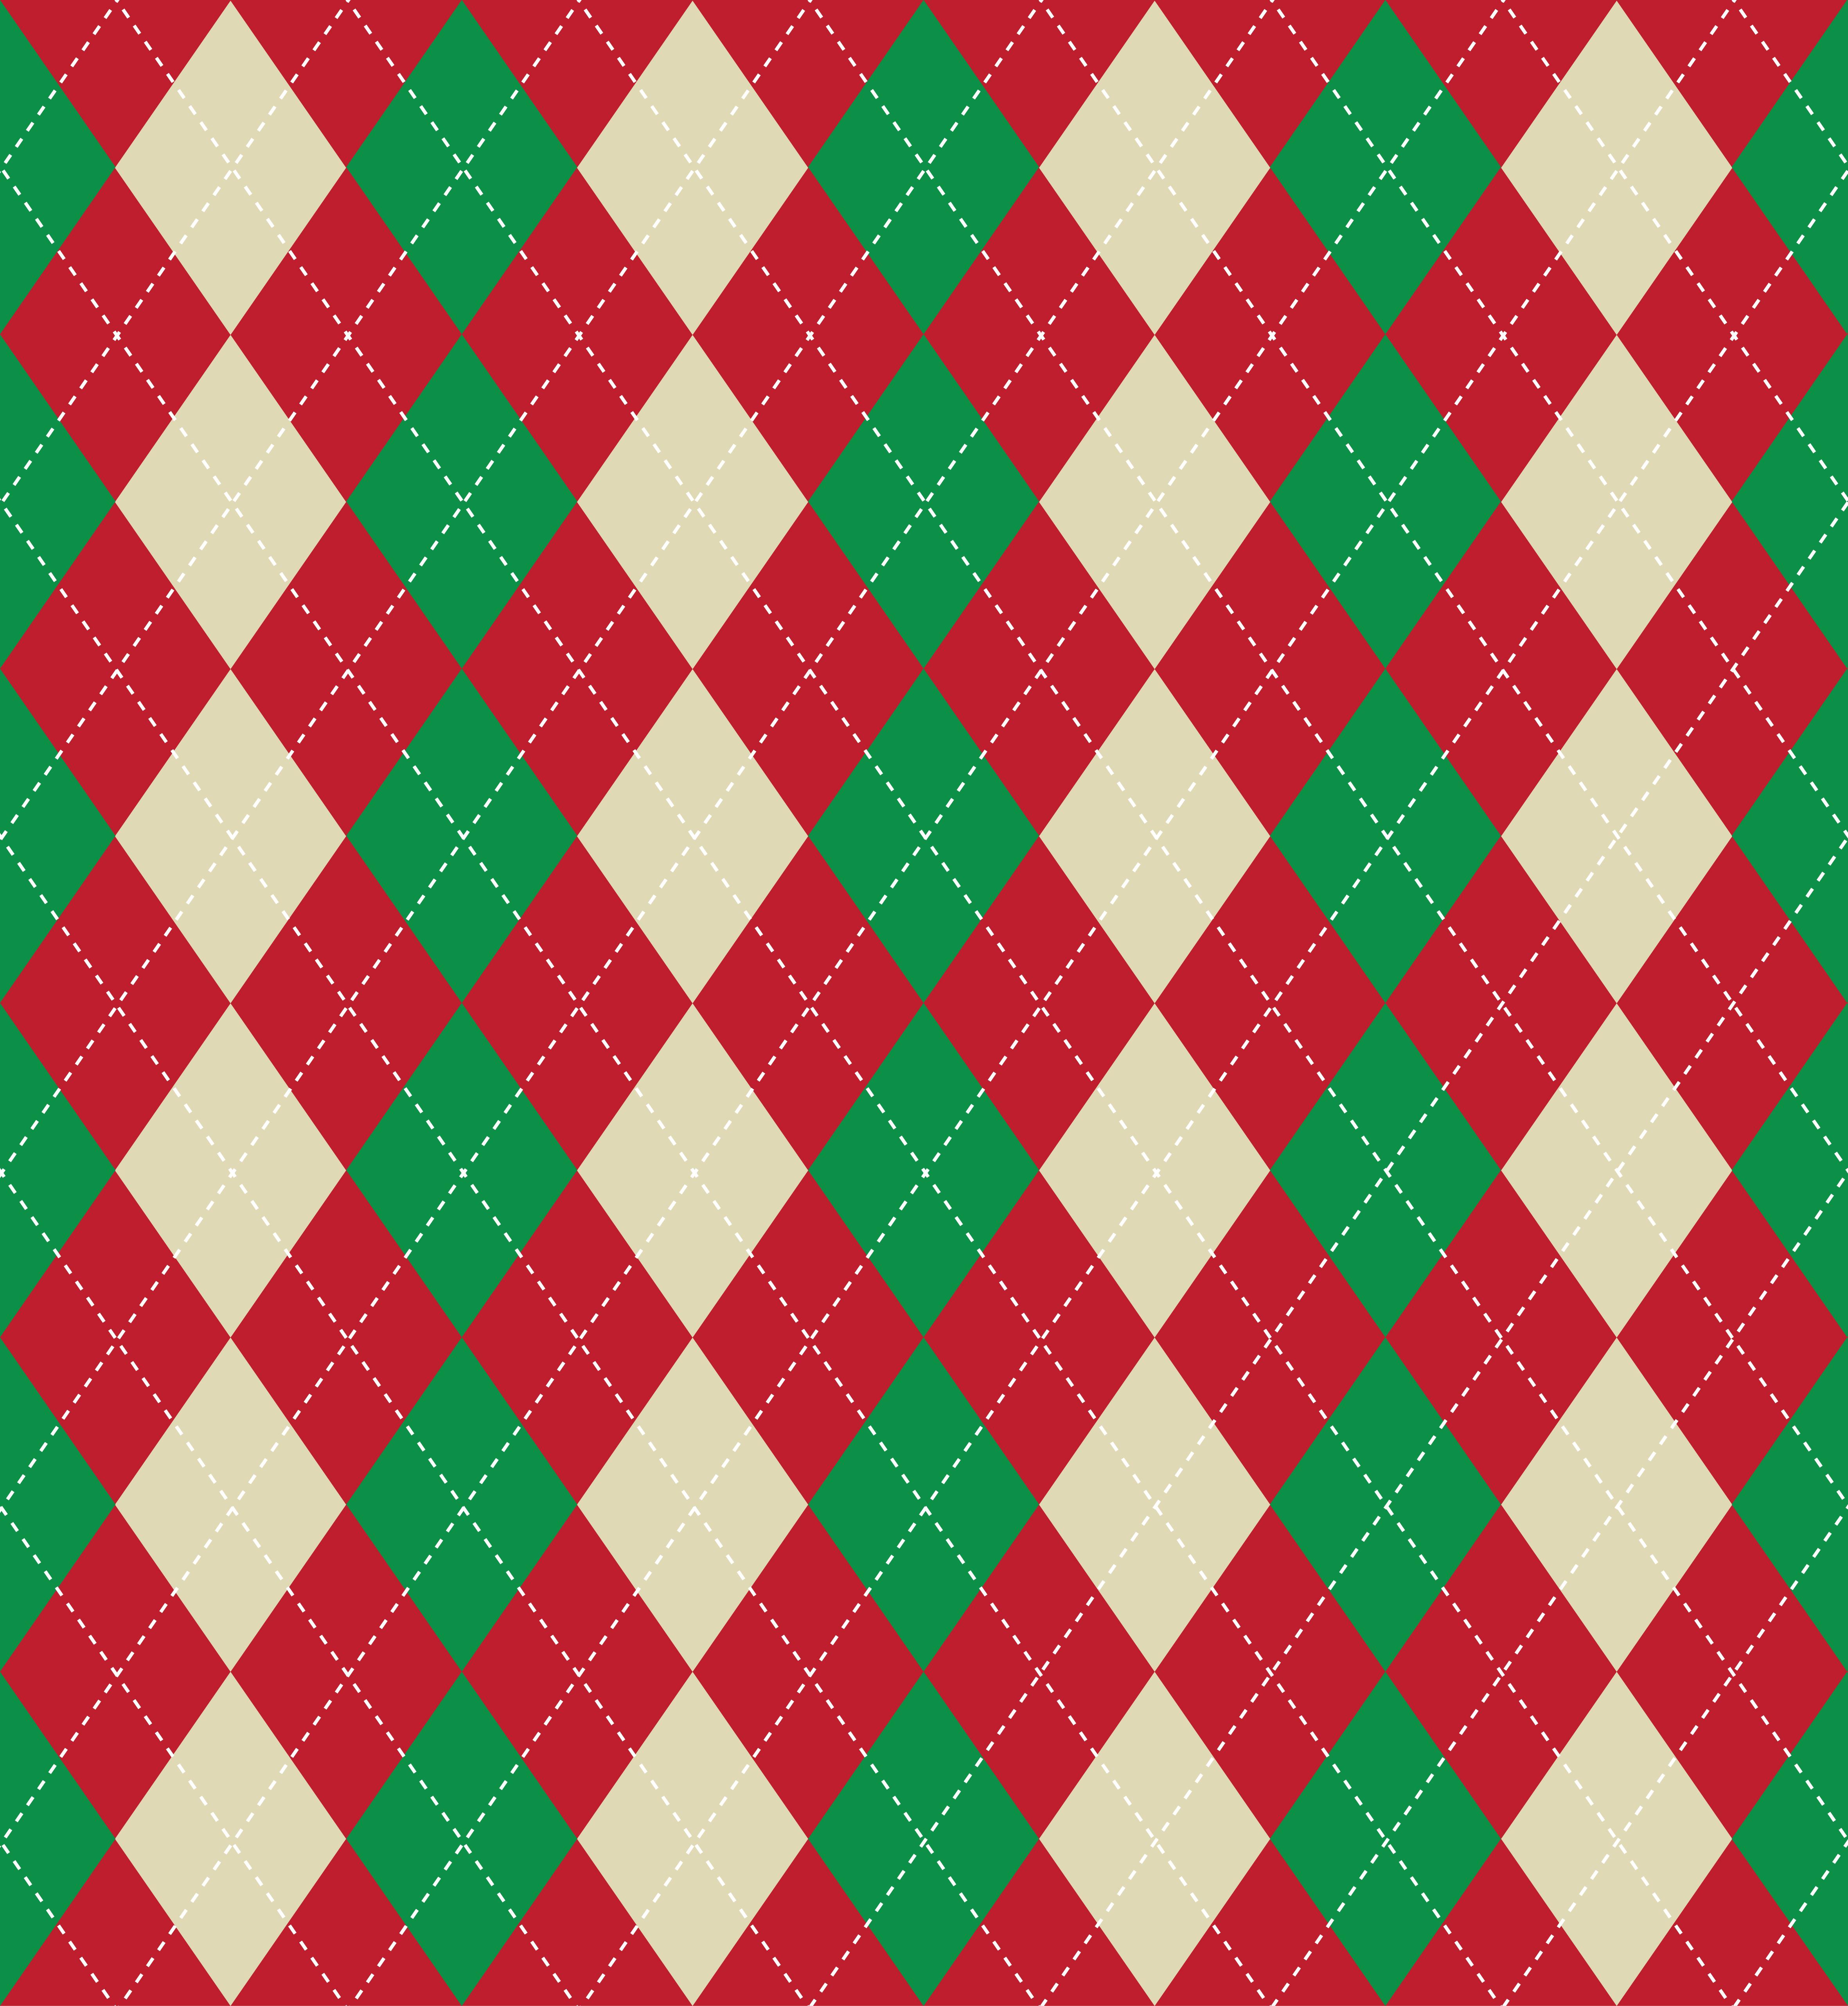 Christmas argyle pattern - Download Free Vectors, Clipart ...